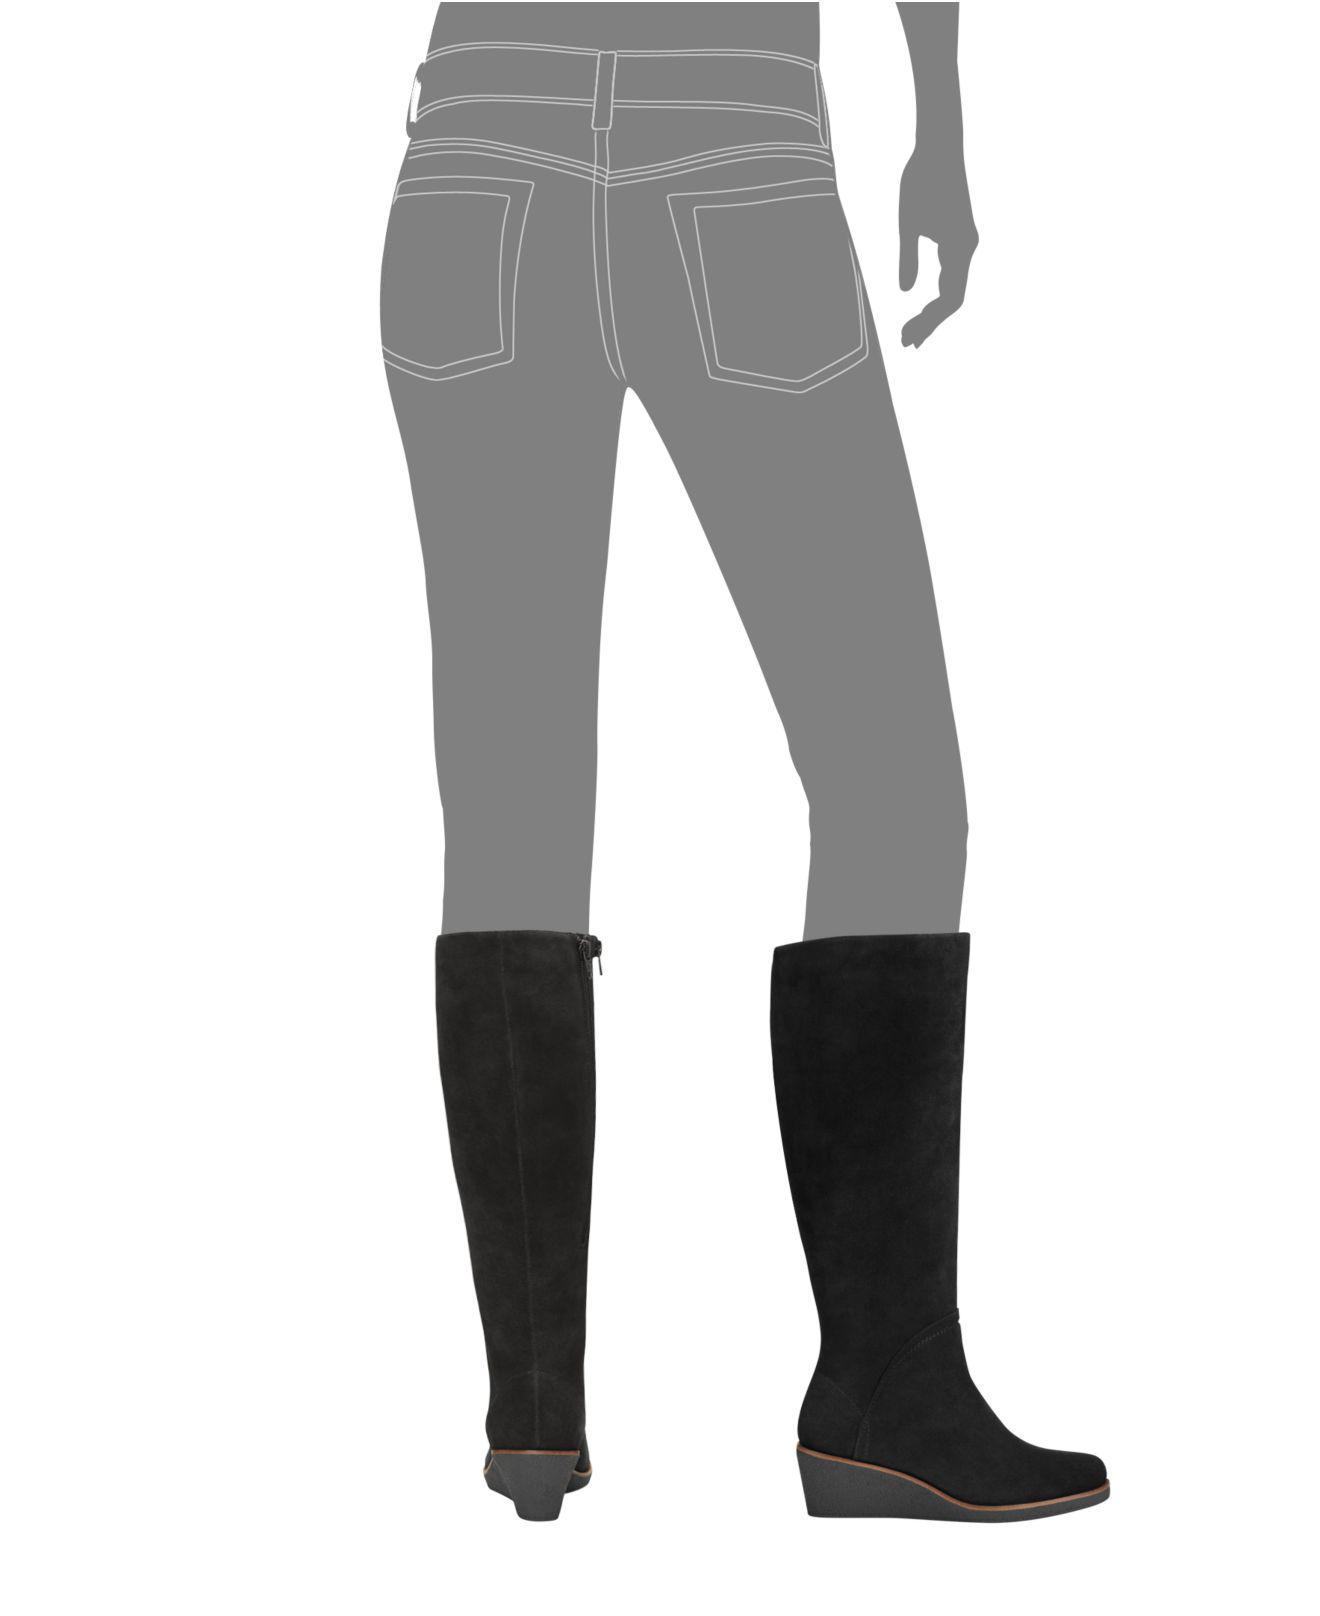 Lyst Aerosoles Binocular Cold Weather Boots In Black